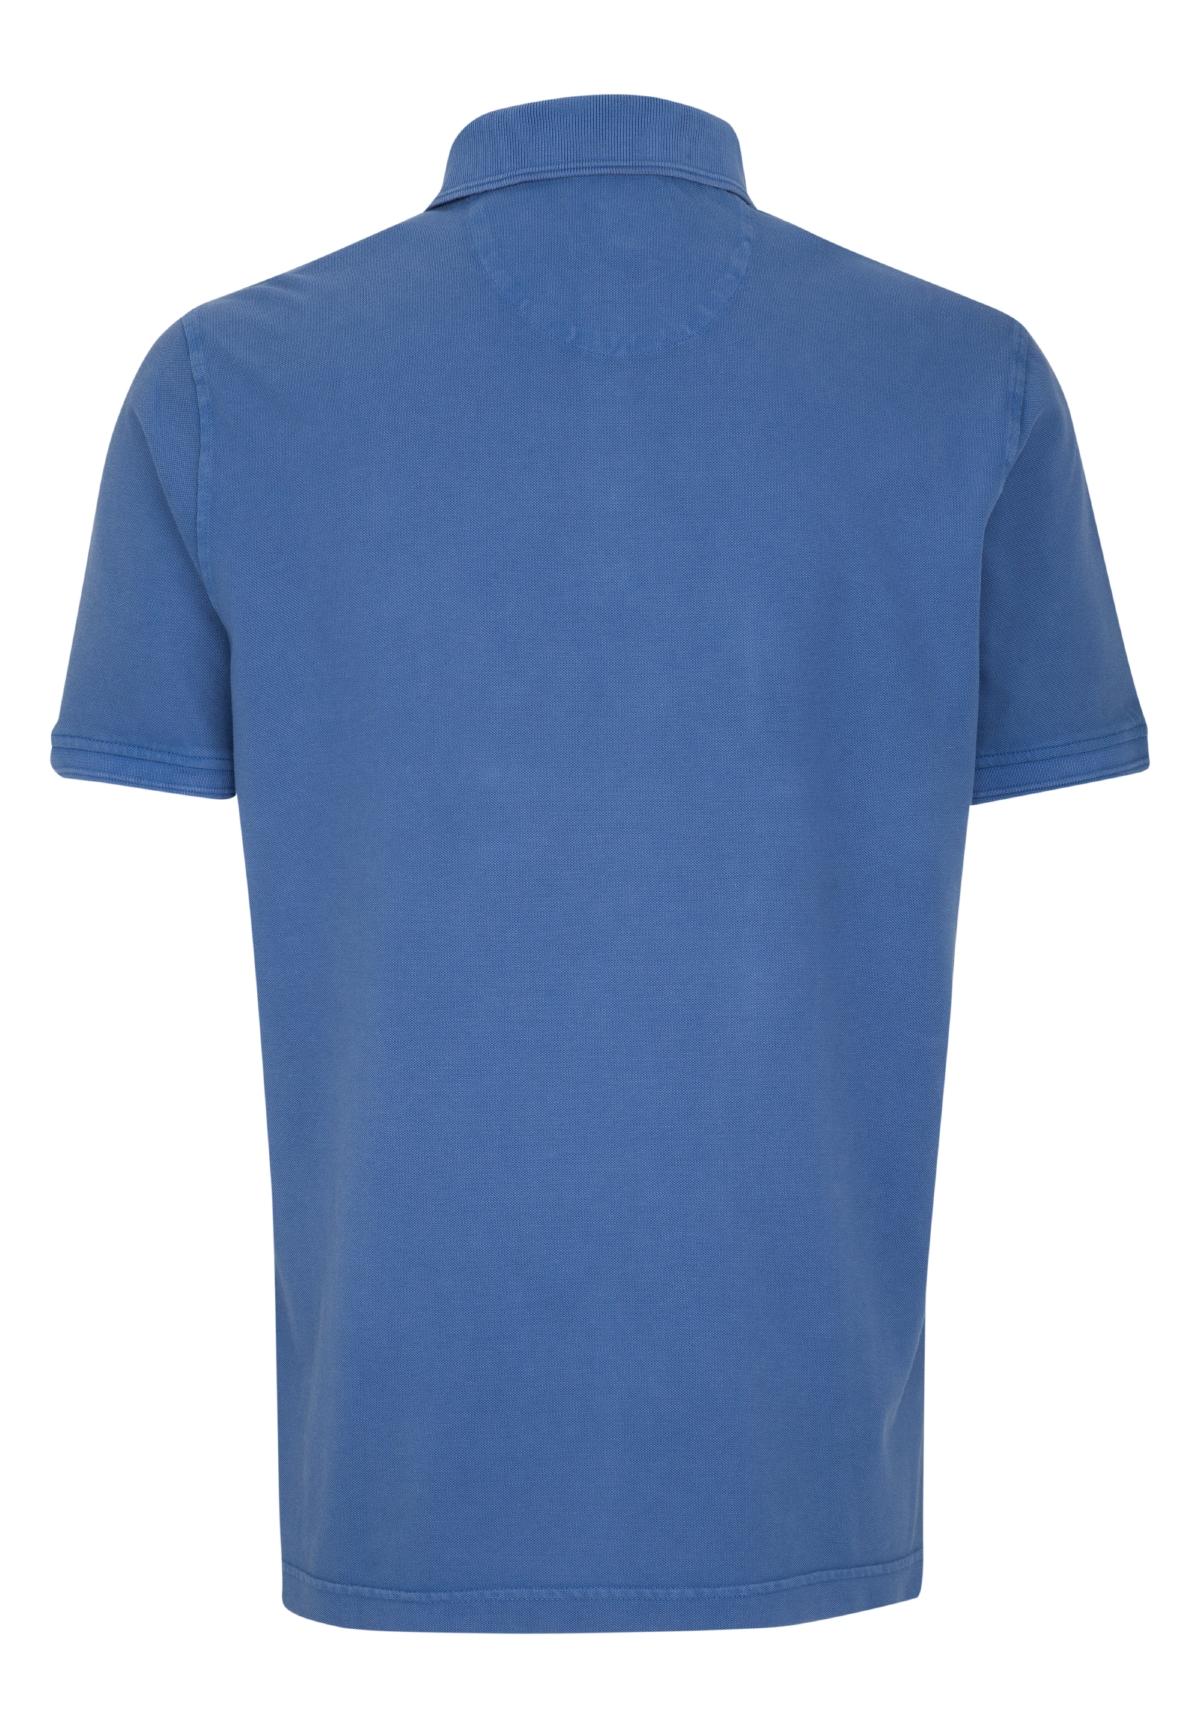 Camel-Active-Herren-Shirt-Poloshirt-Pique-Regular-Fit-NEU Indexbild 18